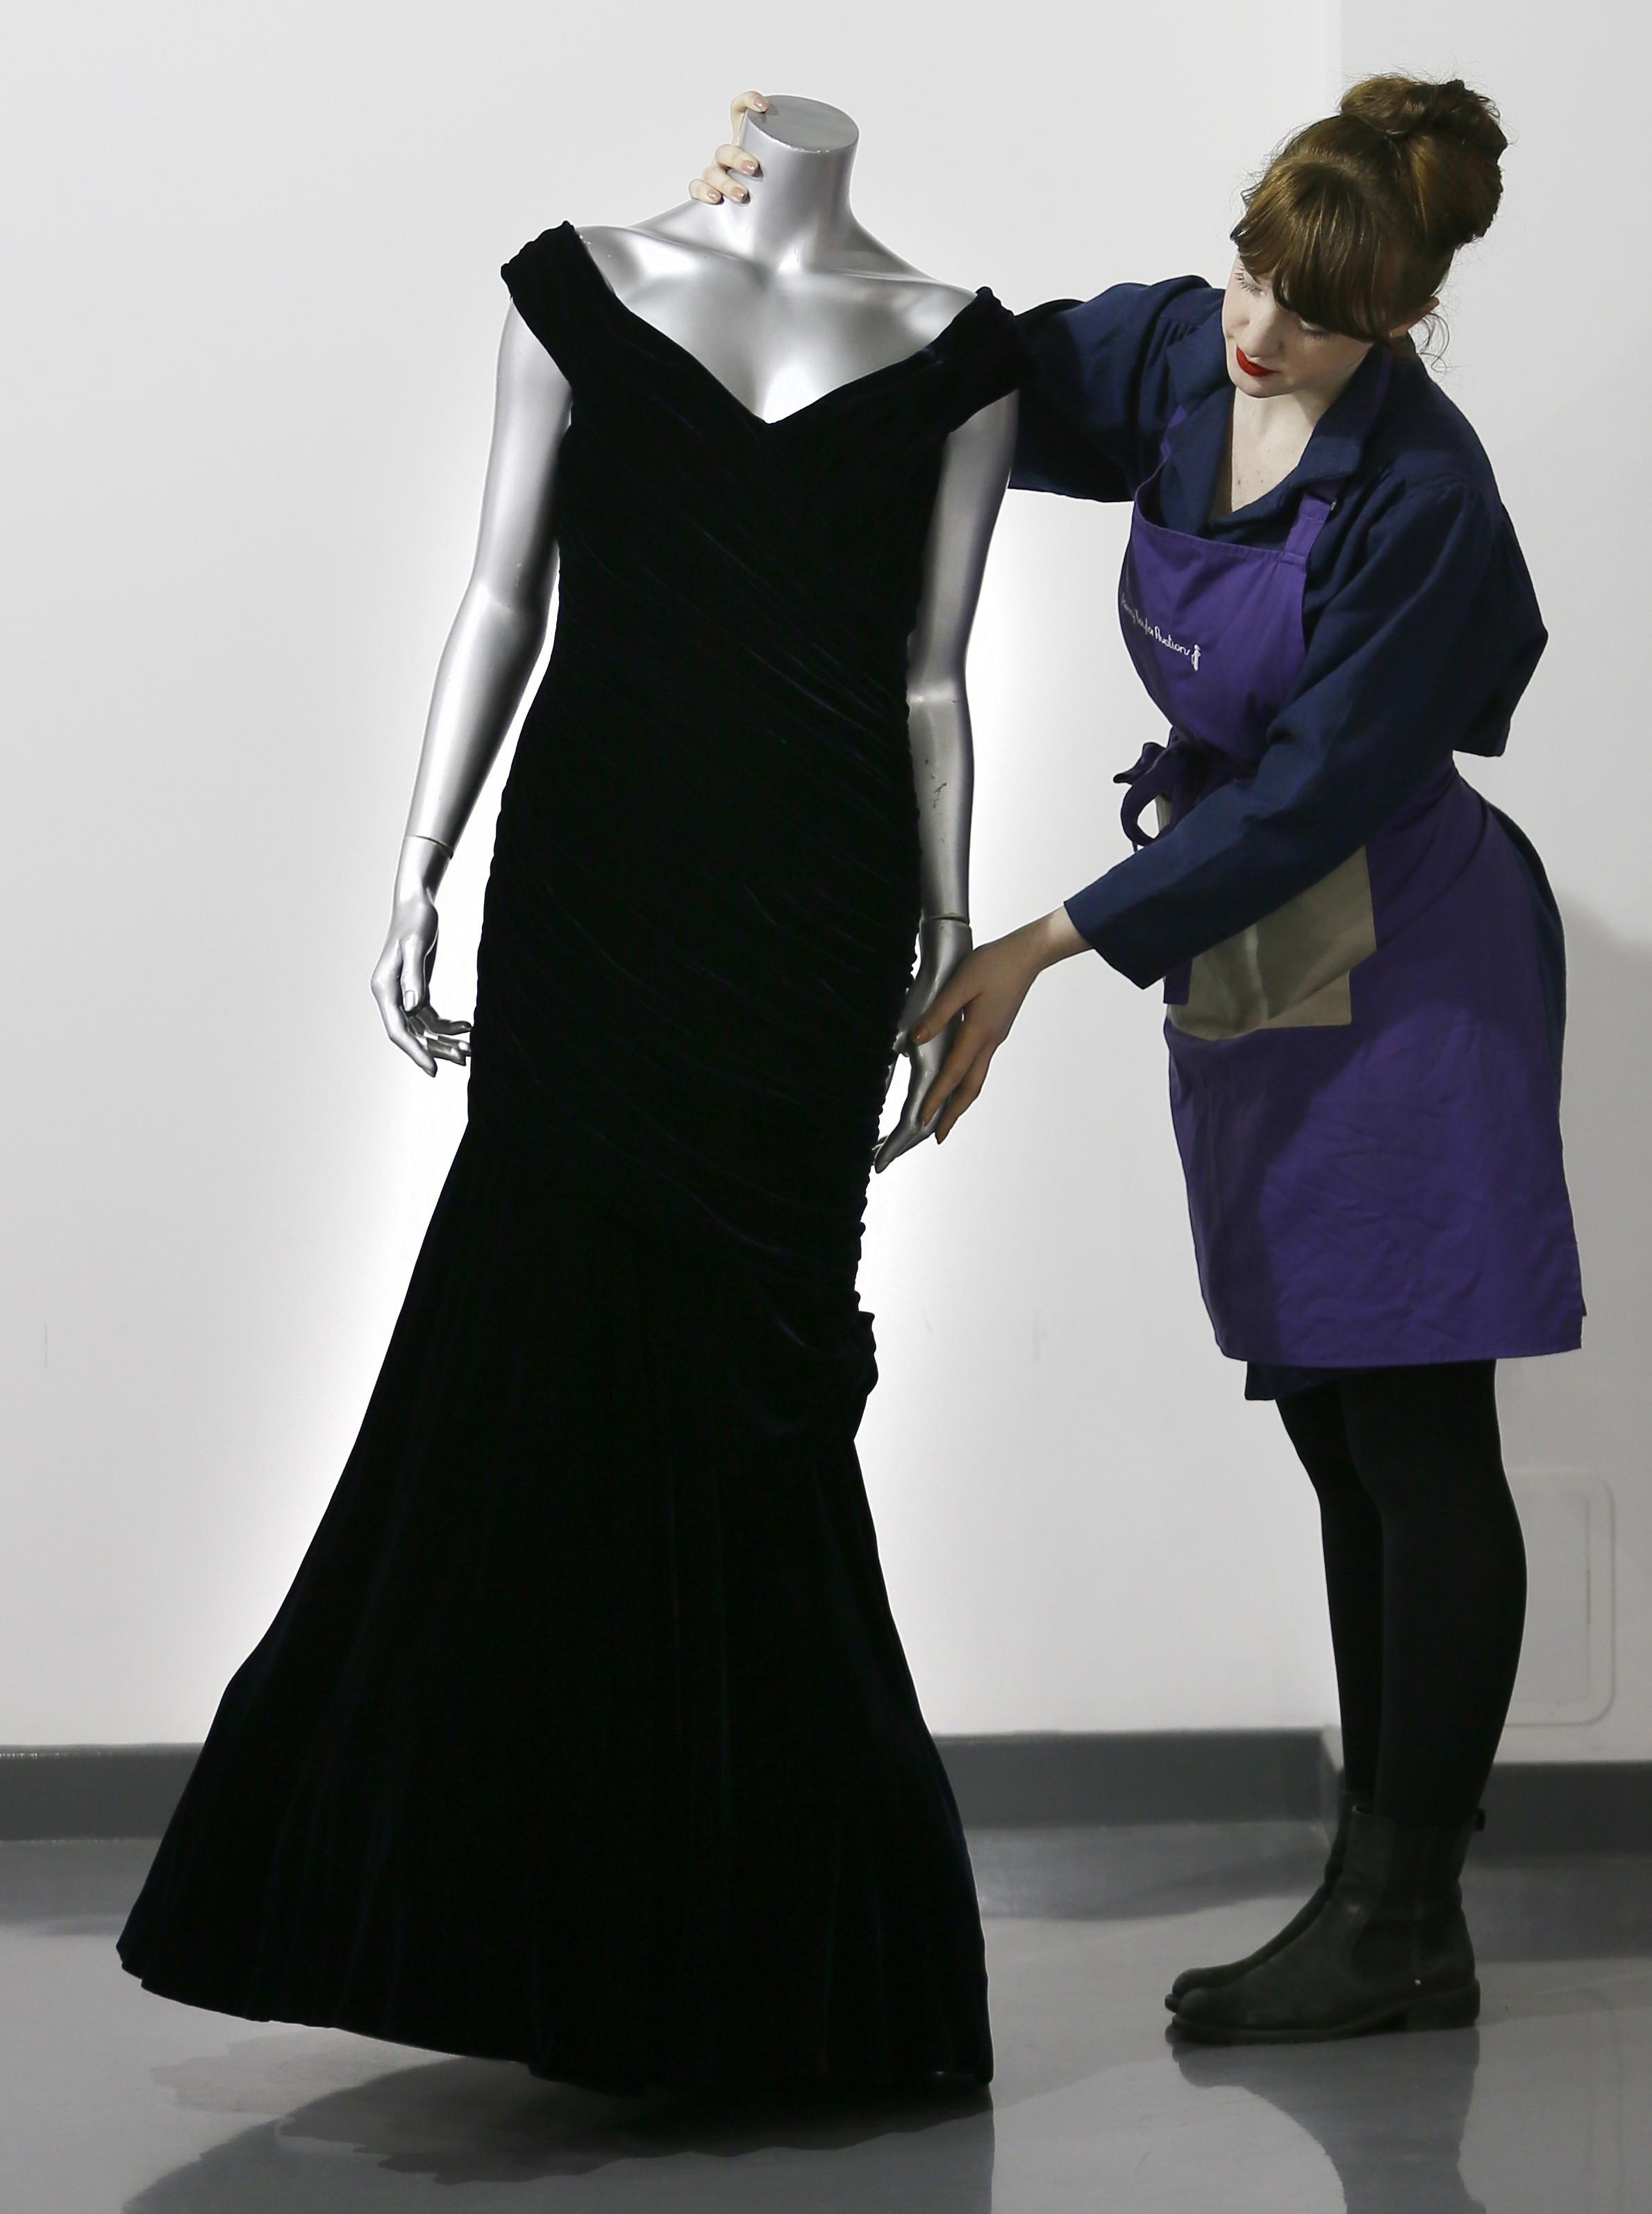 princess diana auction dresses fetch uk london john travolta